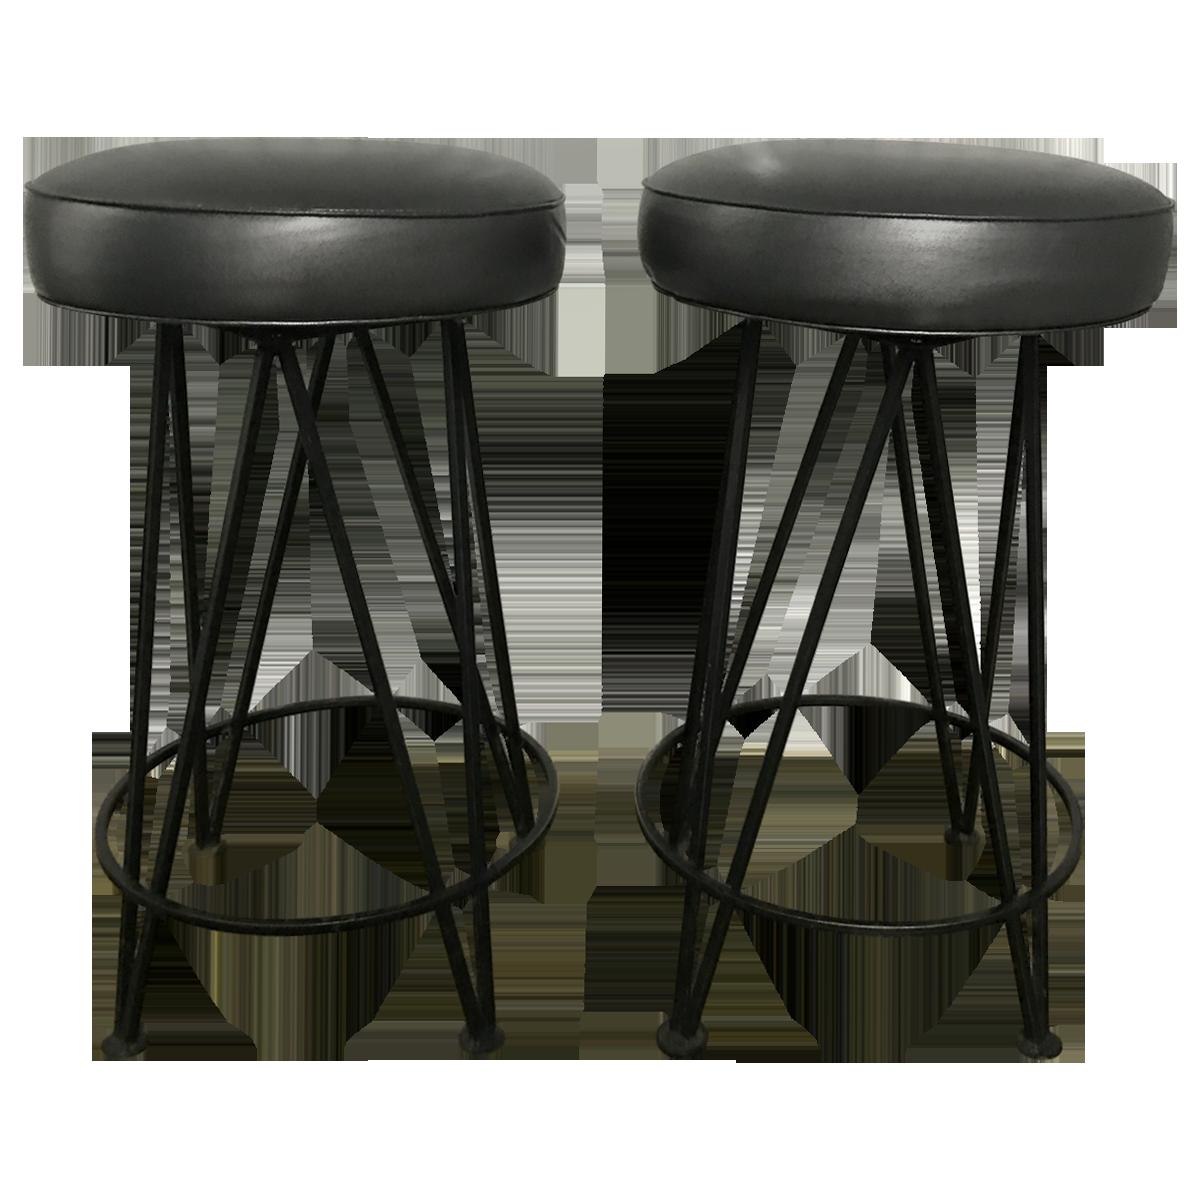 Vintage 1950s Round Black Wrought Iron Hairpin Leg Bar Stools Bar Stools Stool Quartz Or Granite Black wrought iron bar stools